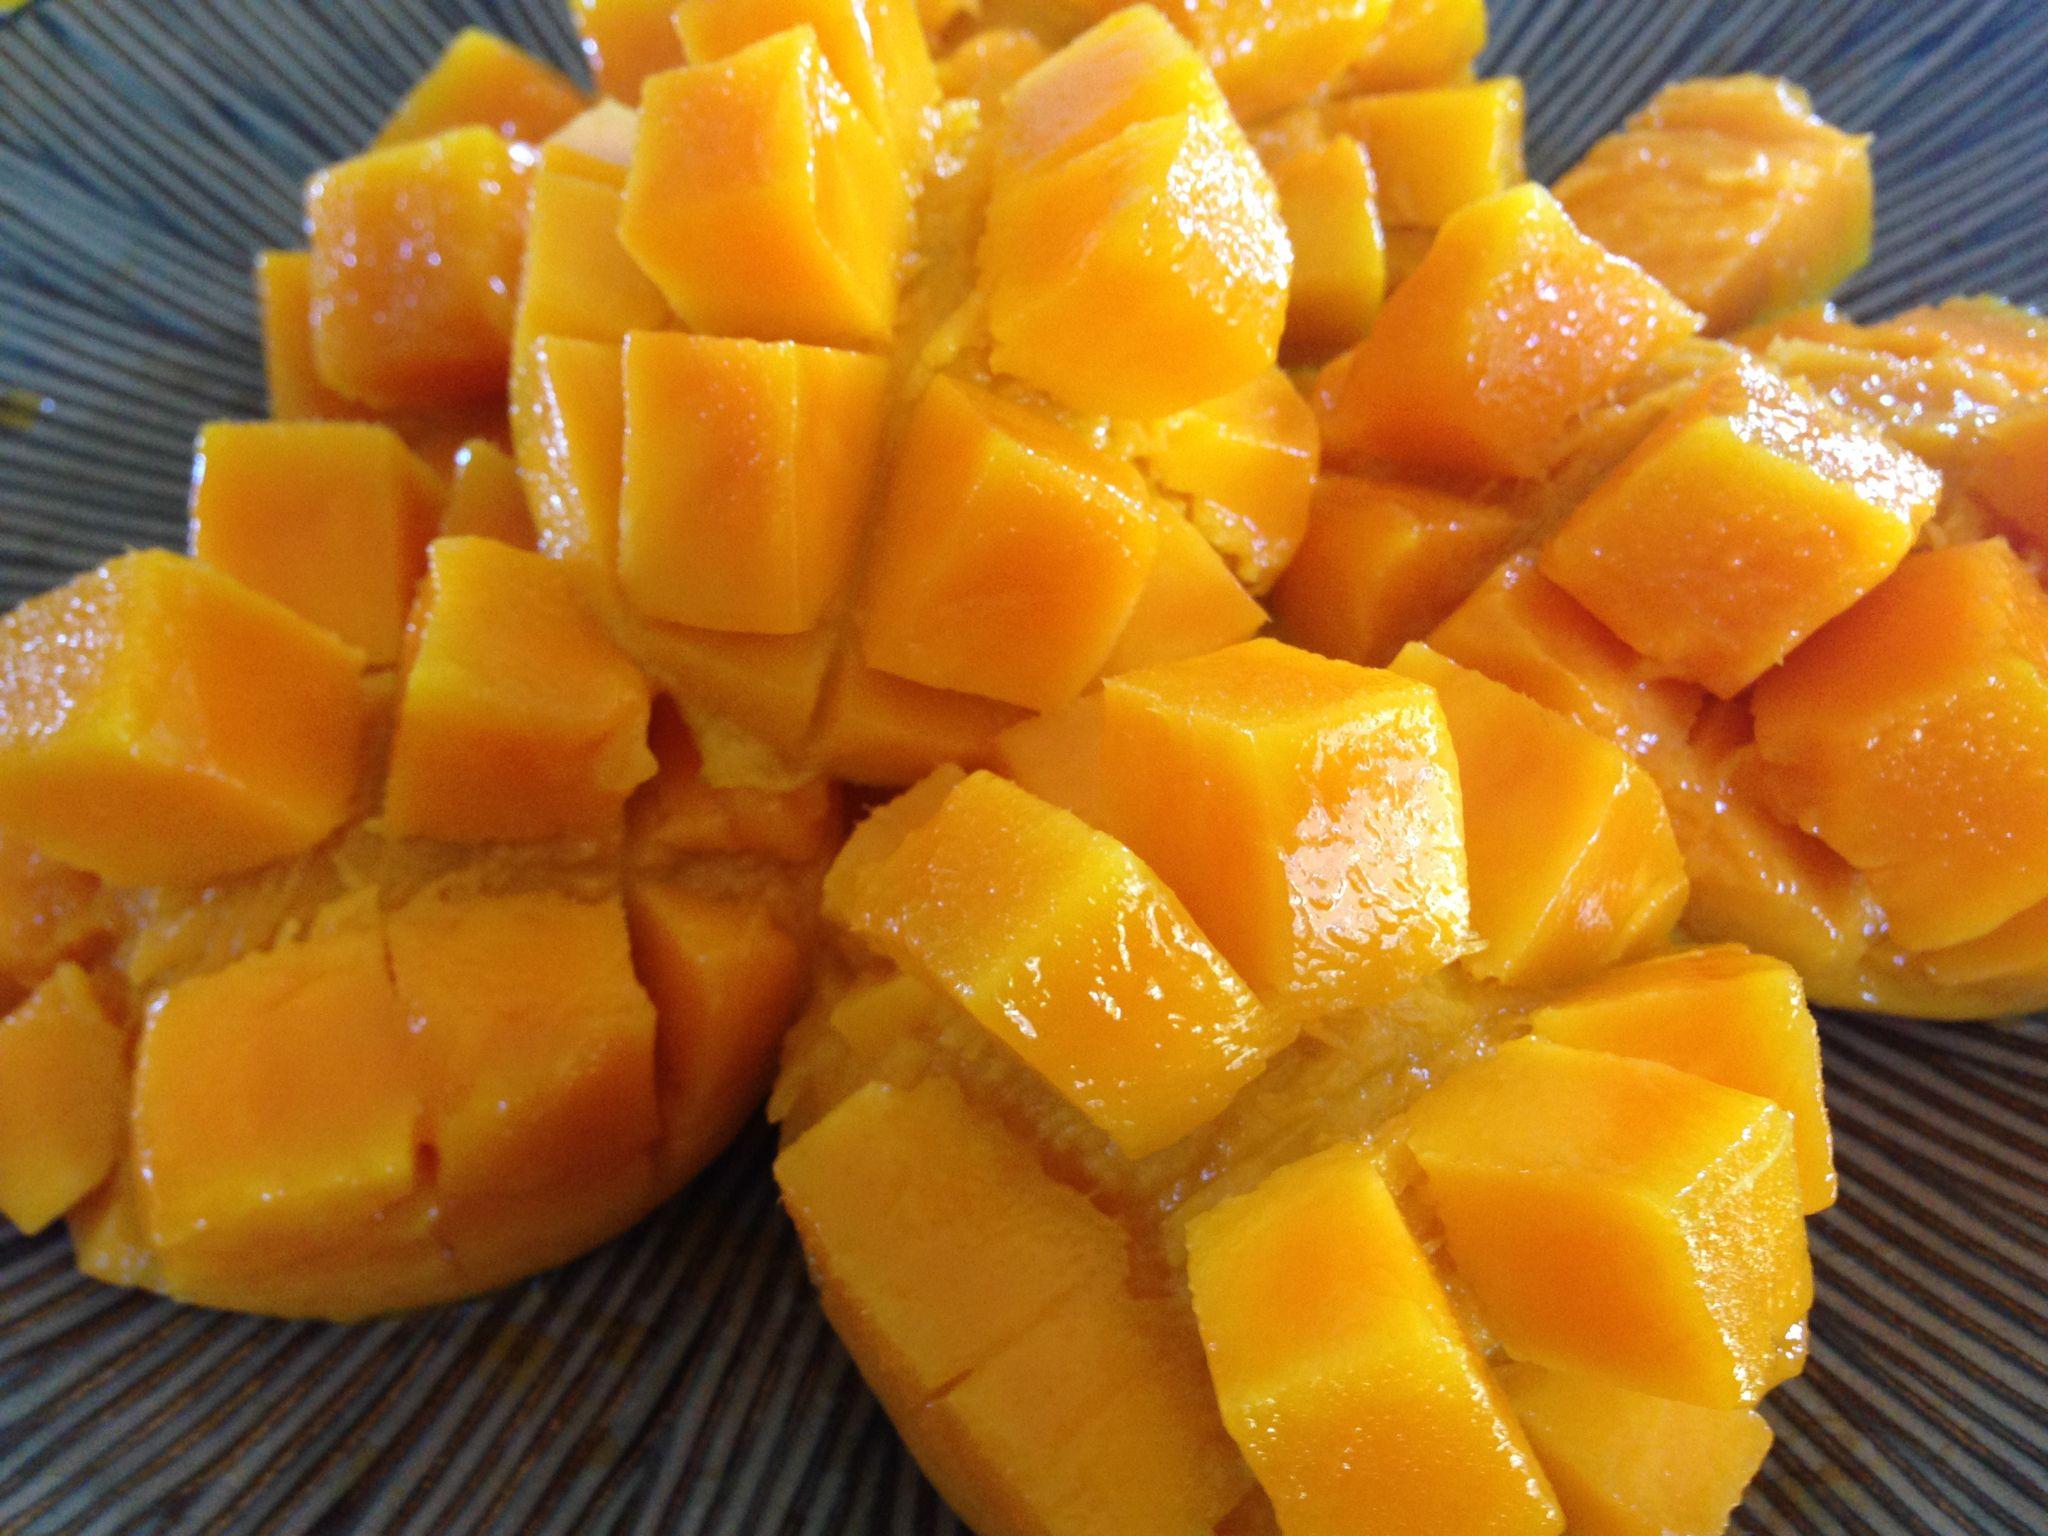 The Best Way To Eat Mango  Backyard Fruit Diaries